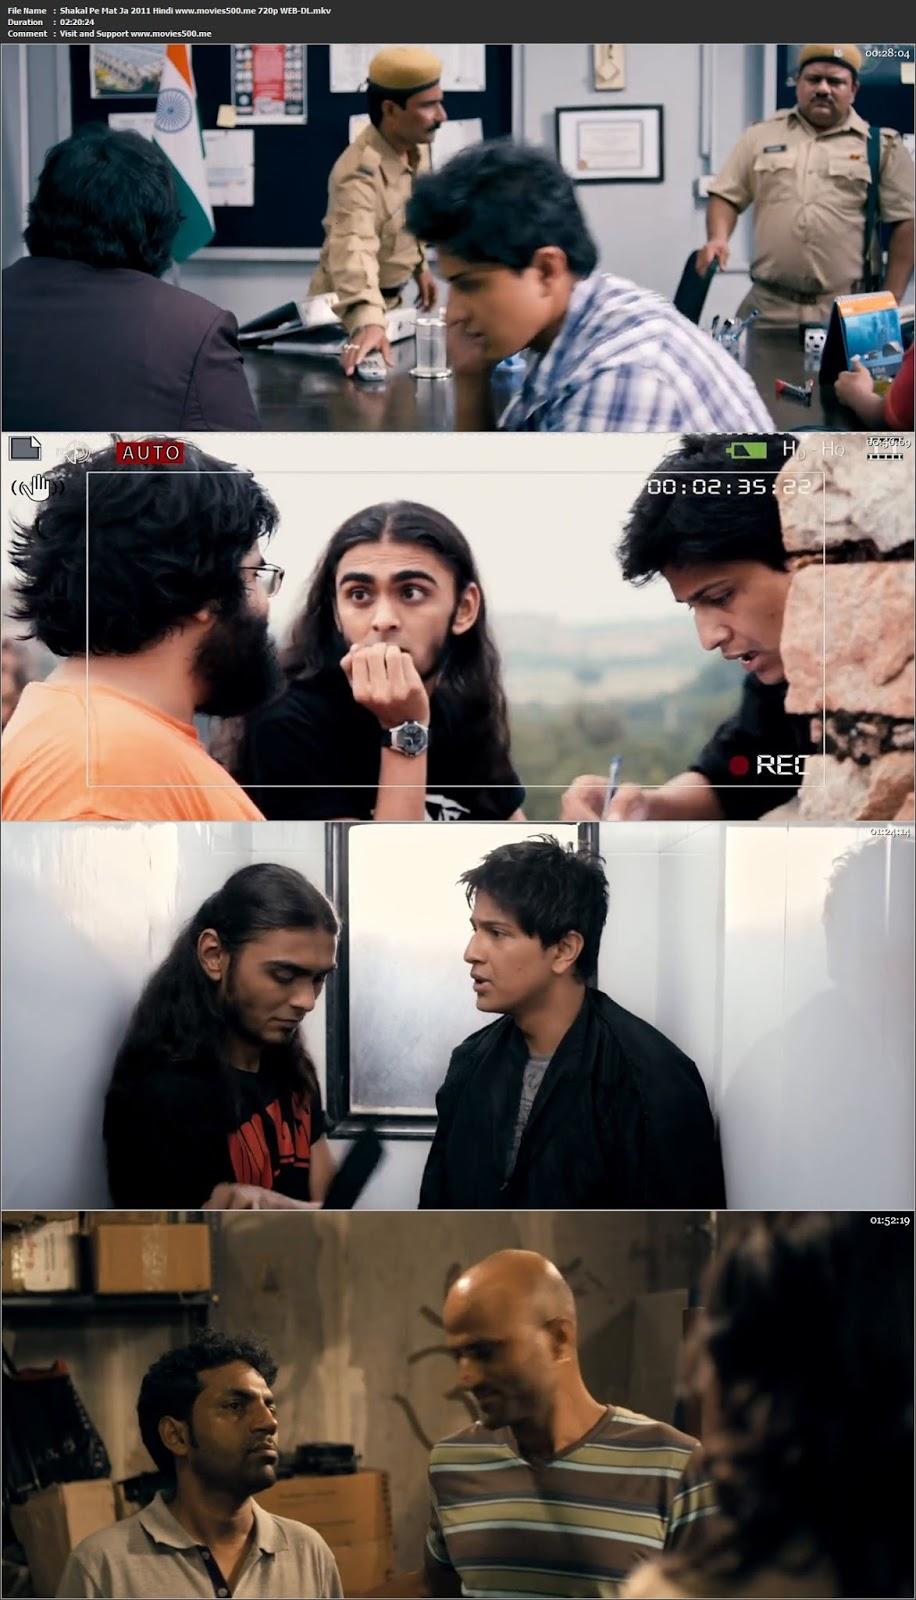 Shakal Pe Mat Ja 2011 Hindi Full Movie WEB DL 720p at 9966132.com